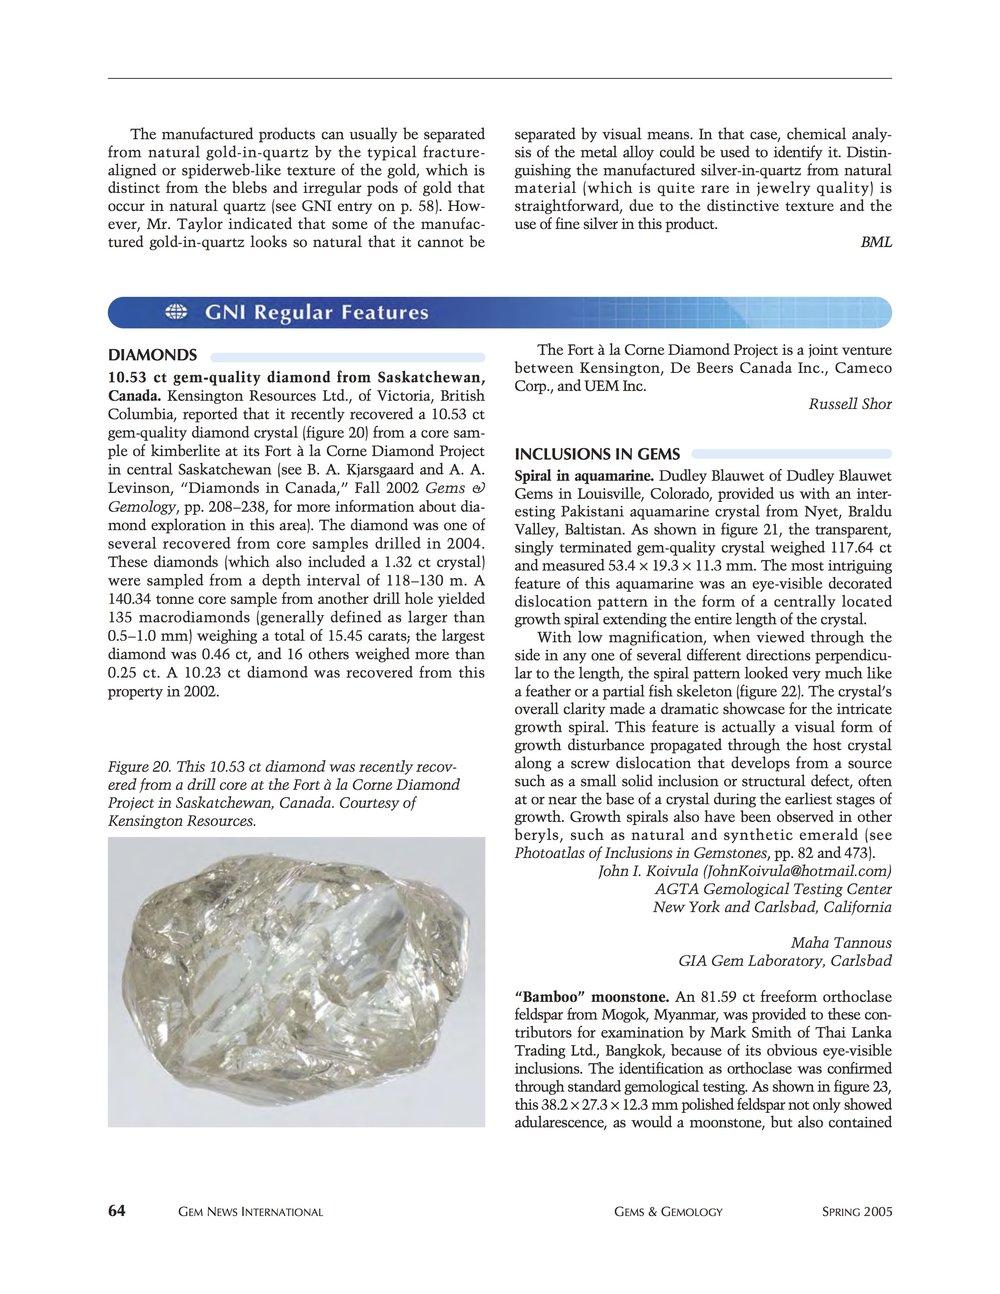 Gems & Gemology - Spring 2015 p.1